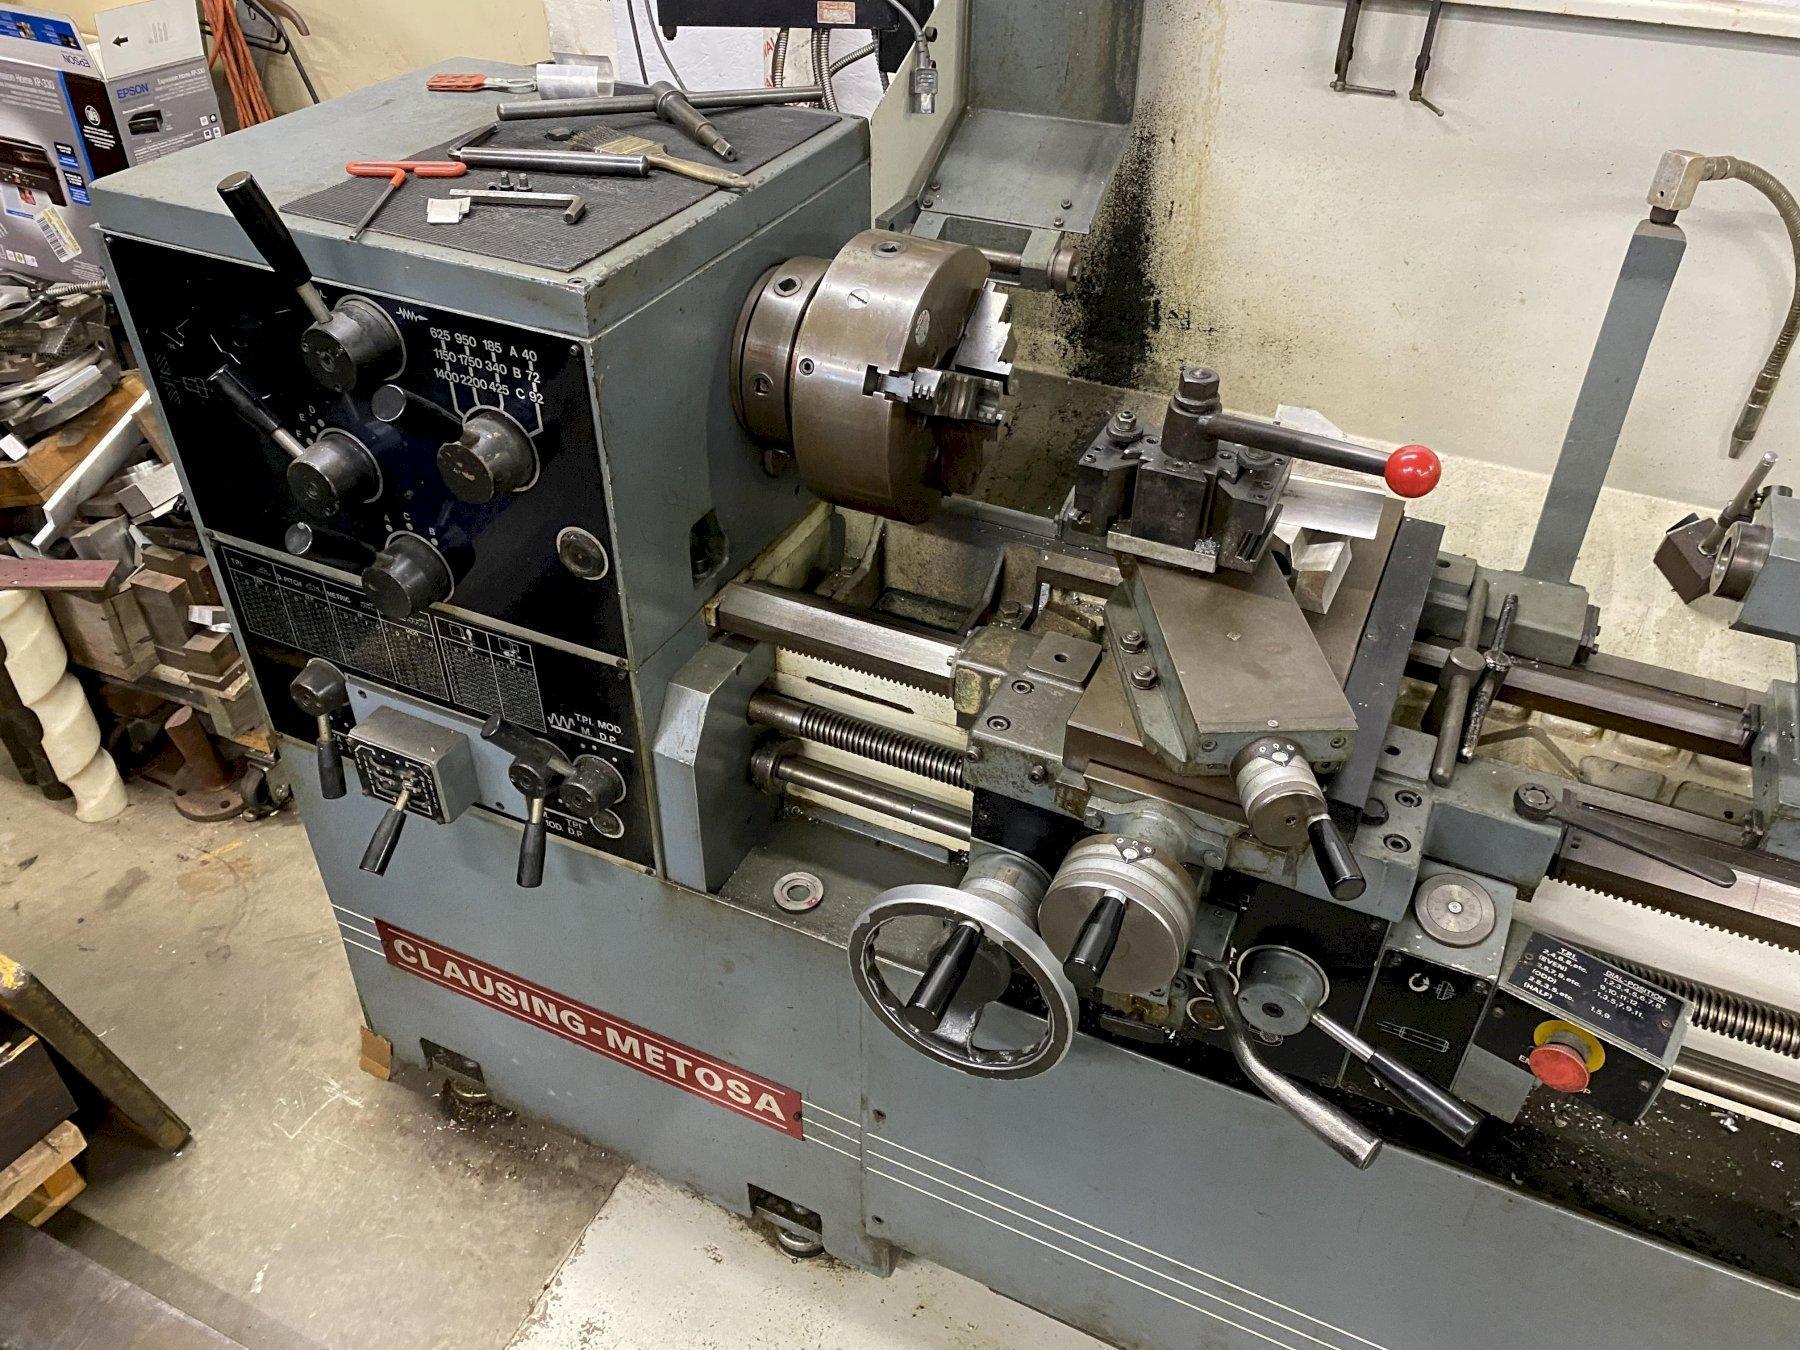 "16"" X 65"" CLAUSING METOSA C1565LC ENGINE LATHE. STOCK # 0634921"